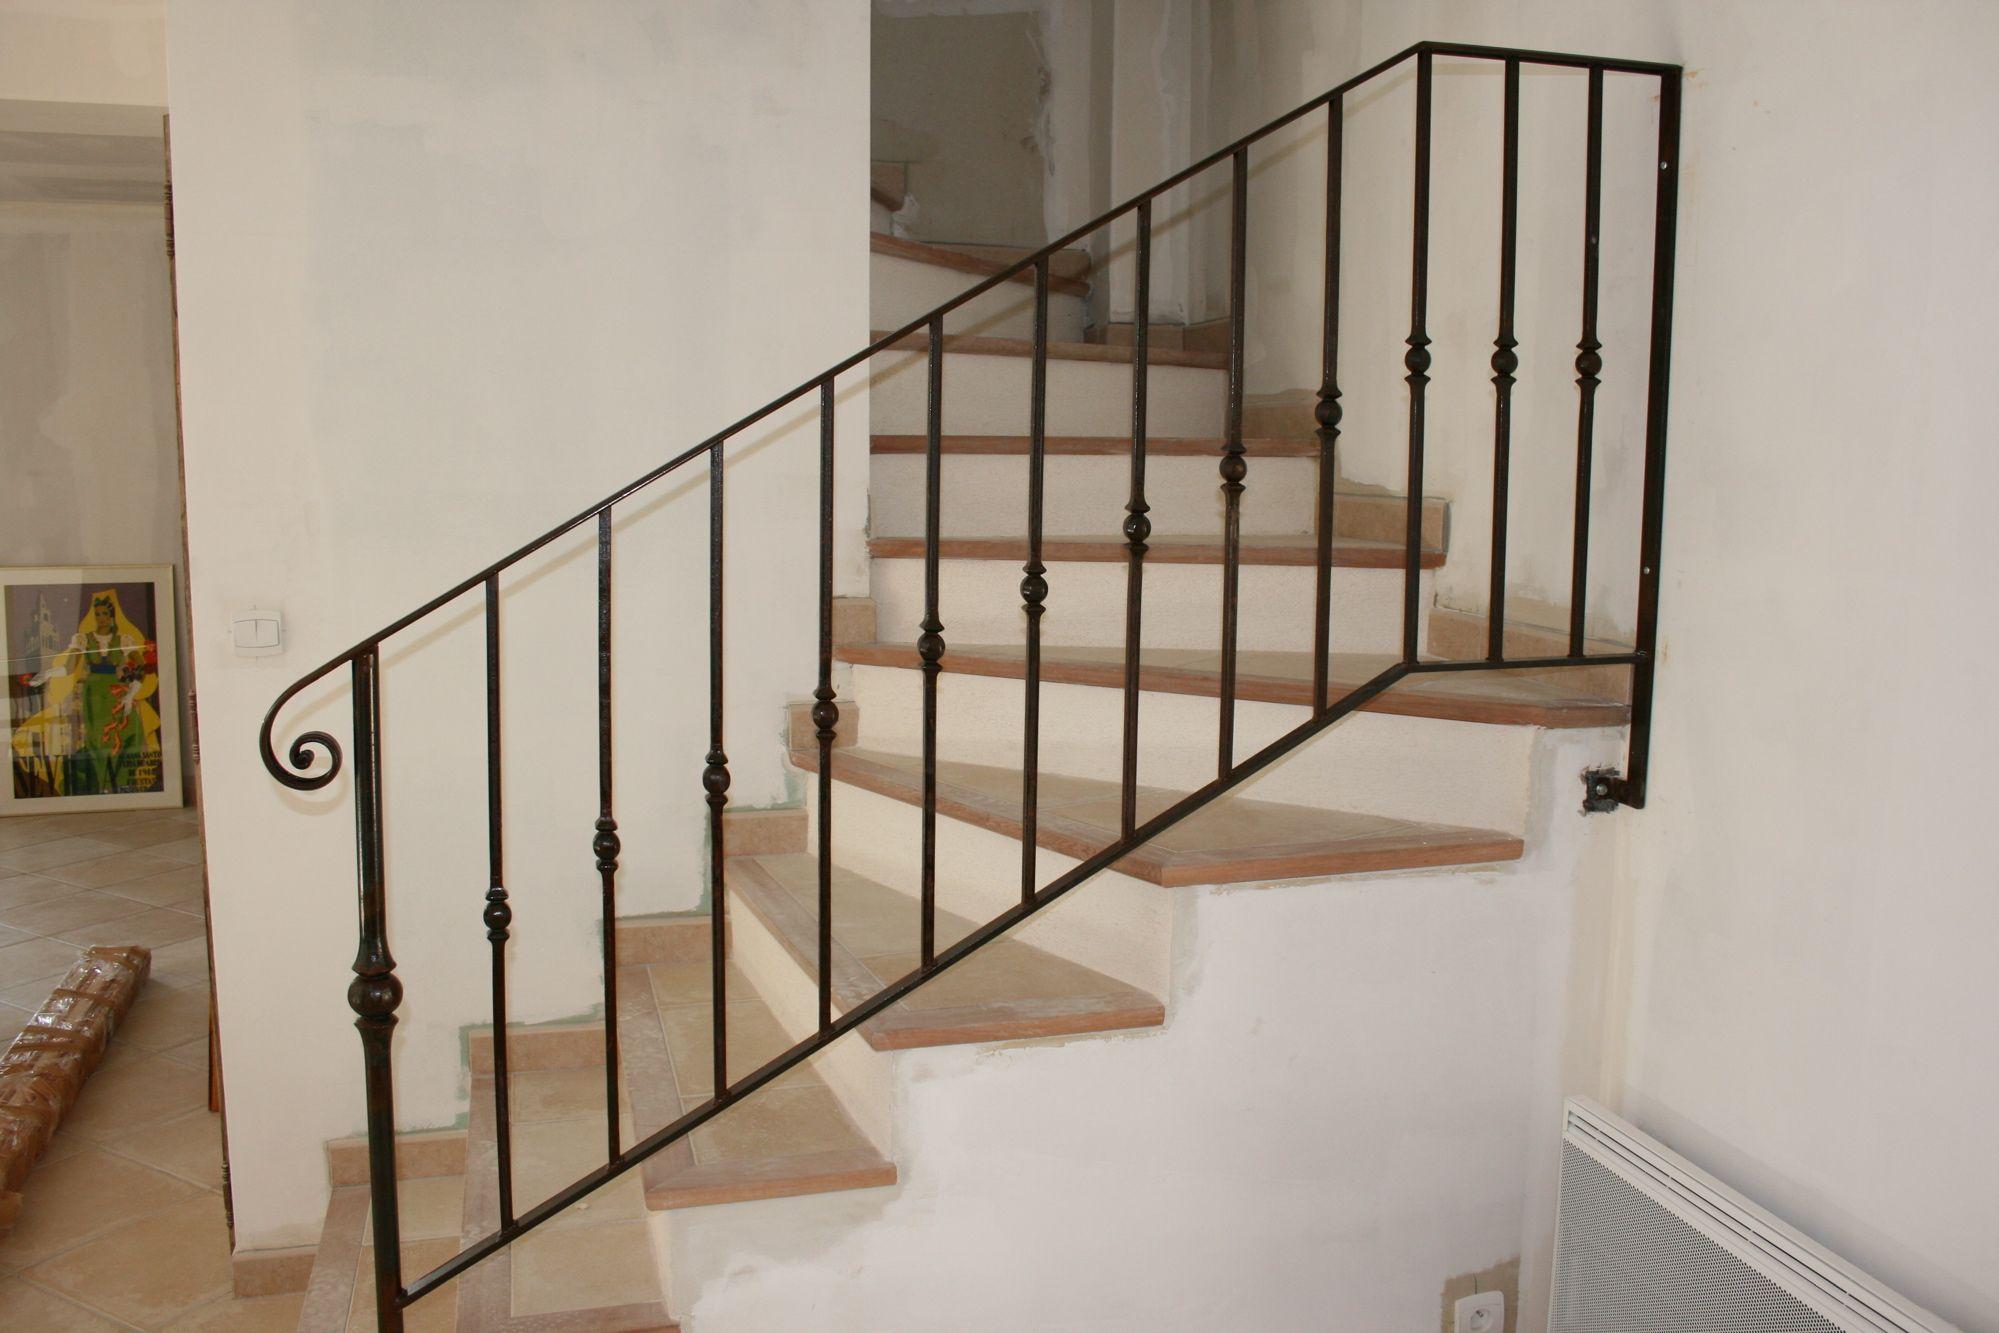 Barriere Escalier En Colimaçon la maison du bas » famille damery | escalier fer, rampe escalier